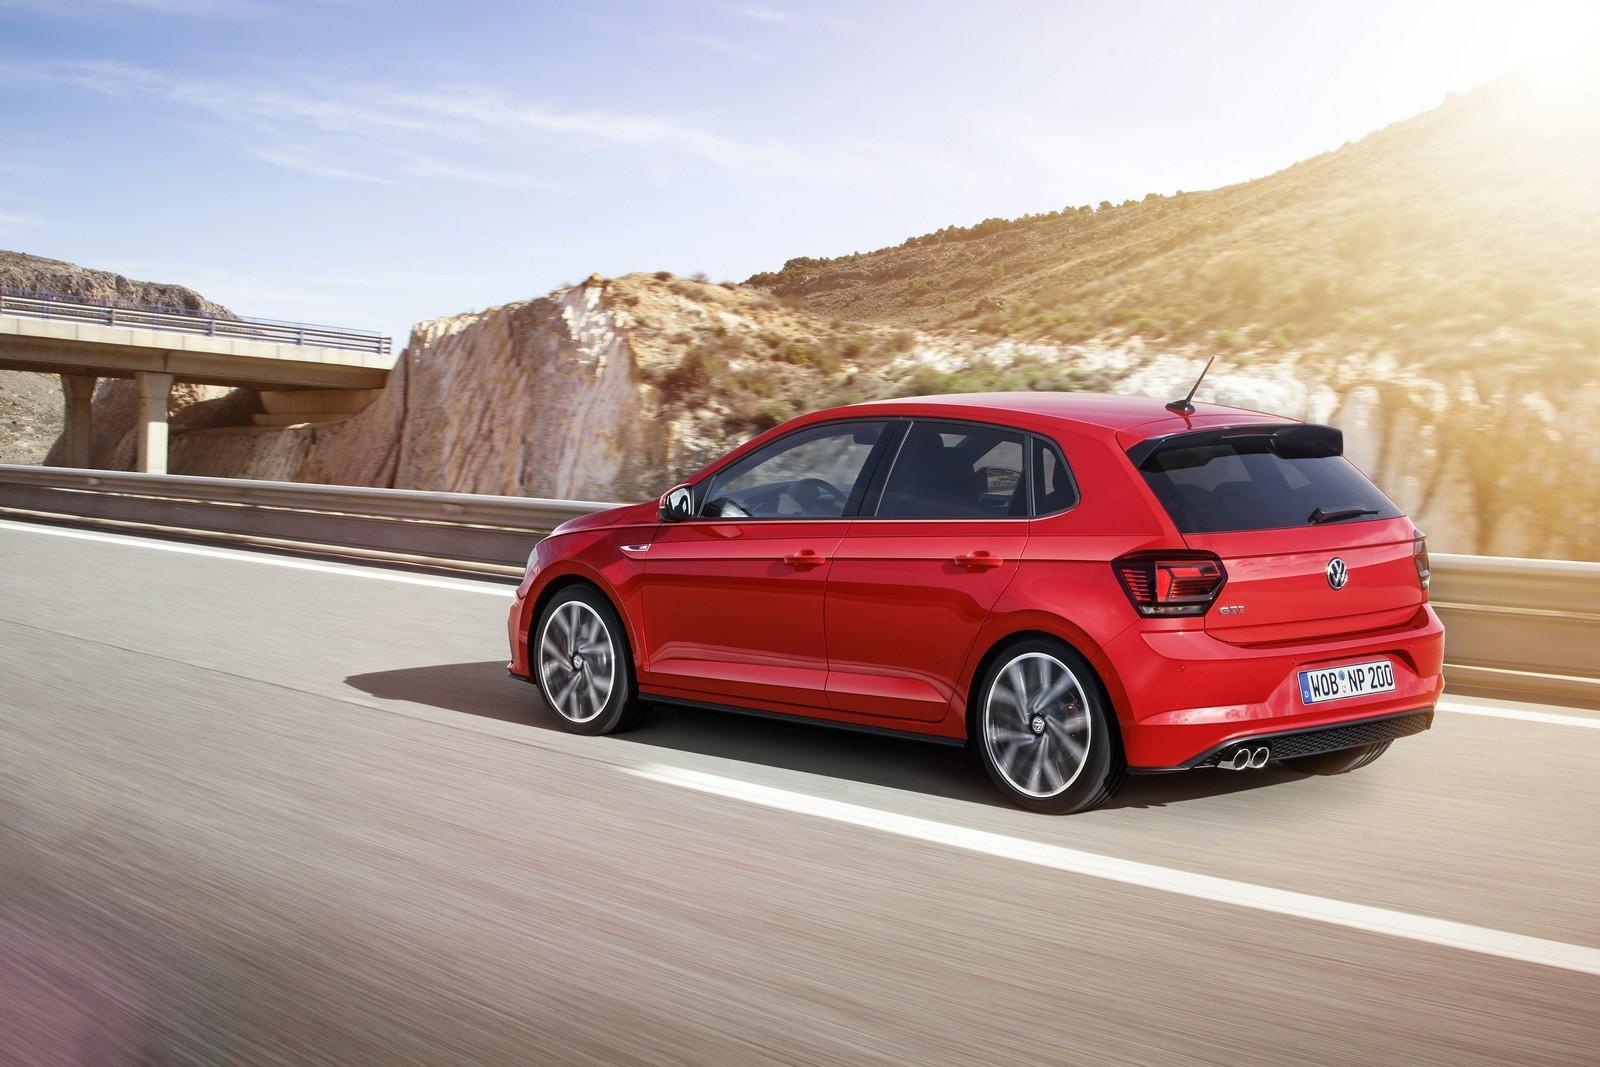 Ya puedes adquirir tu Volkswagen Polo GTI 2018: Desde 23.200 euros